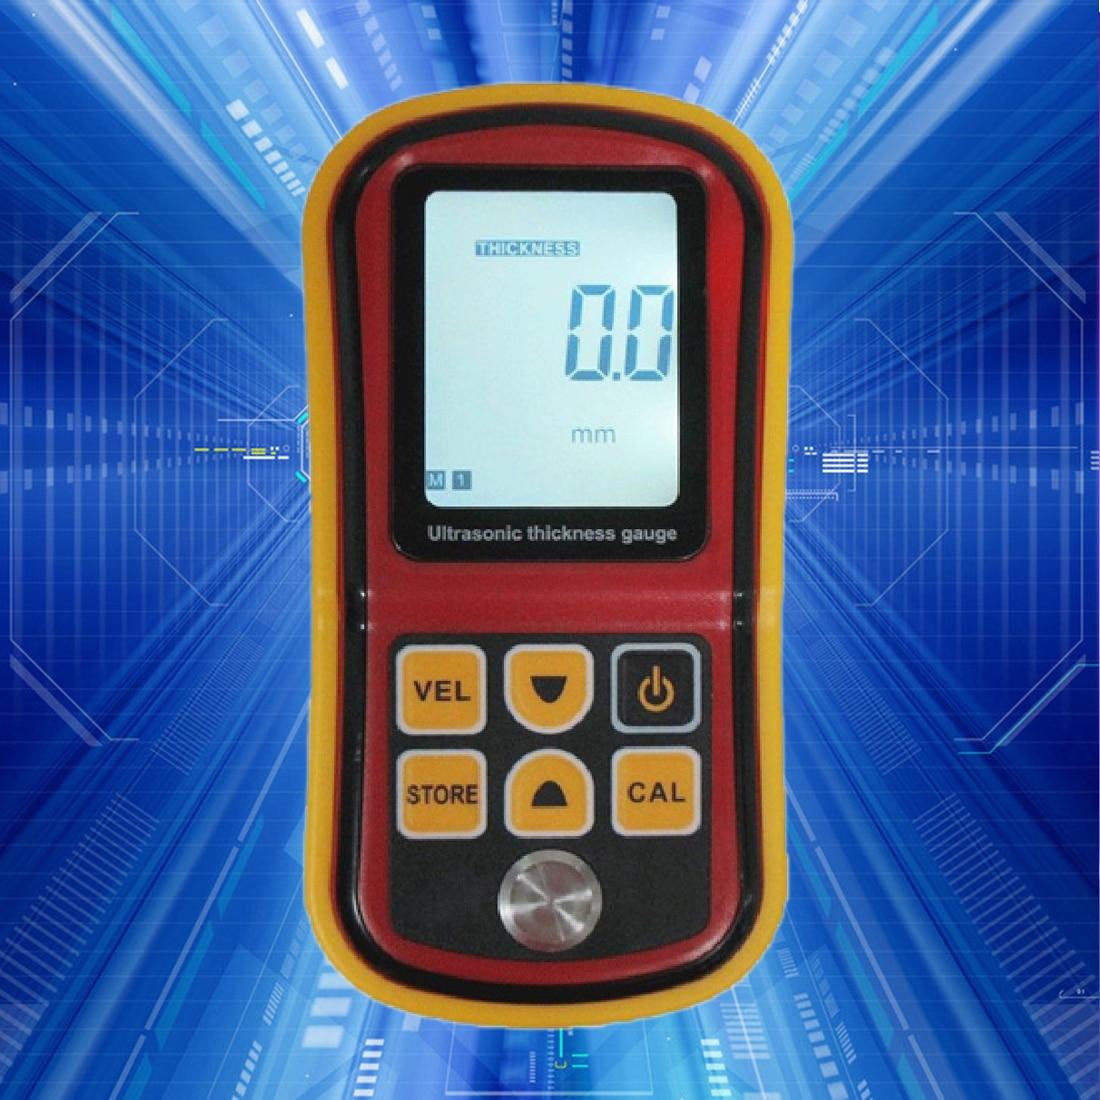 1.2~225mm (Steel) GM100 Ultrasonic Thickness Gauge Tester A multimeter Range finder LCD backlight display1.2~225mm (Steel) GM100 Ultrasonic Thickness Gauge Tester A multimeter Range finder LCD backlight display